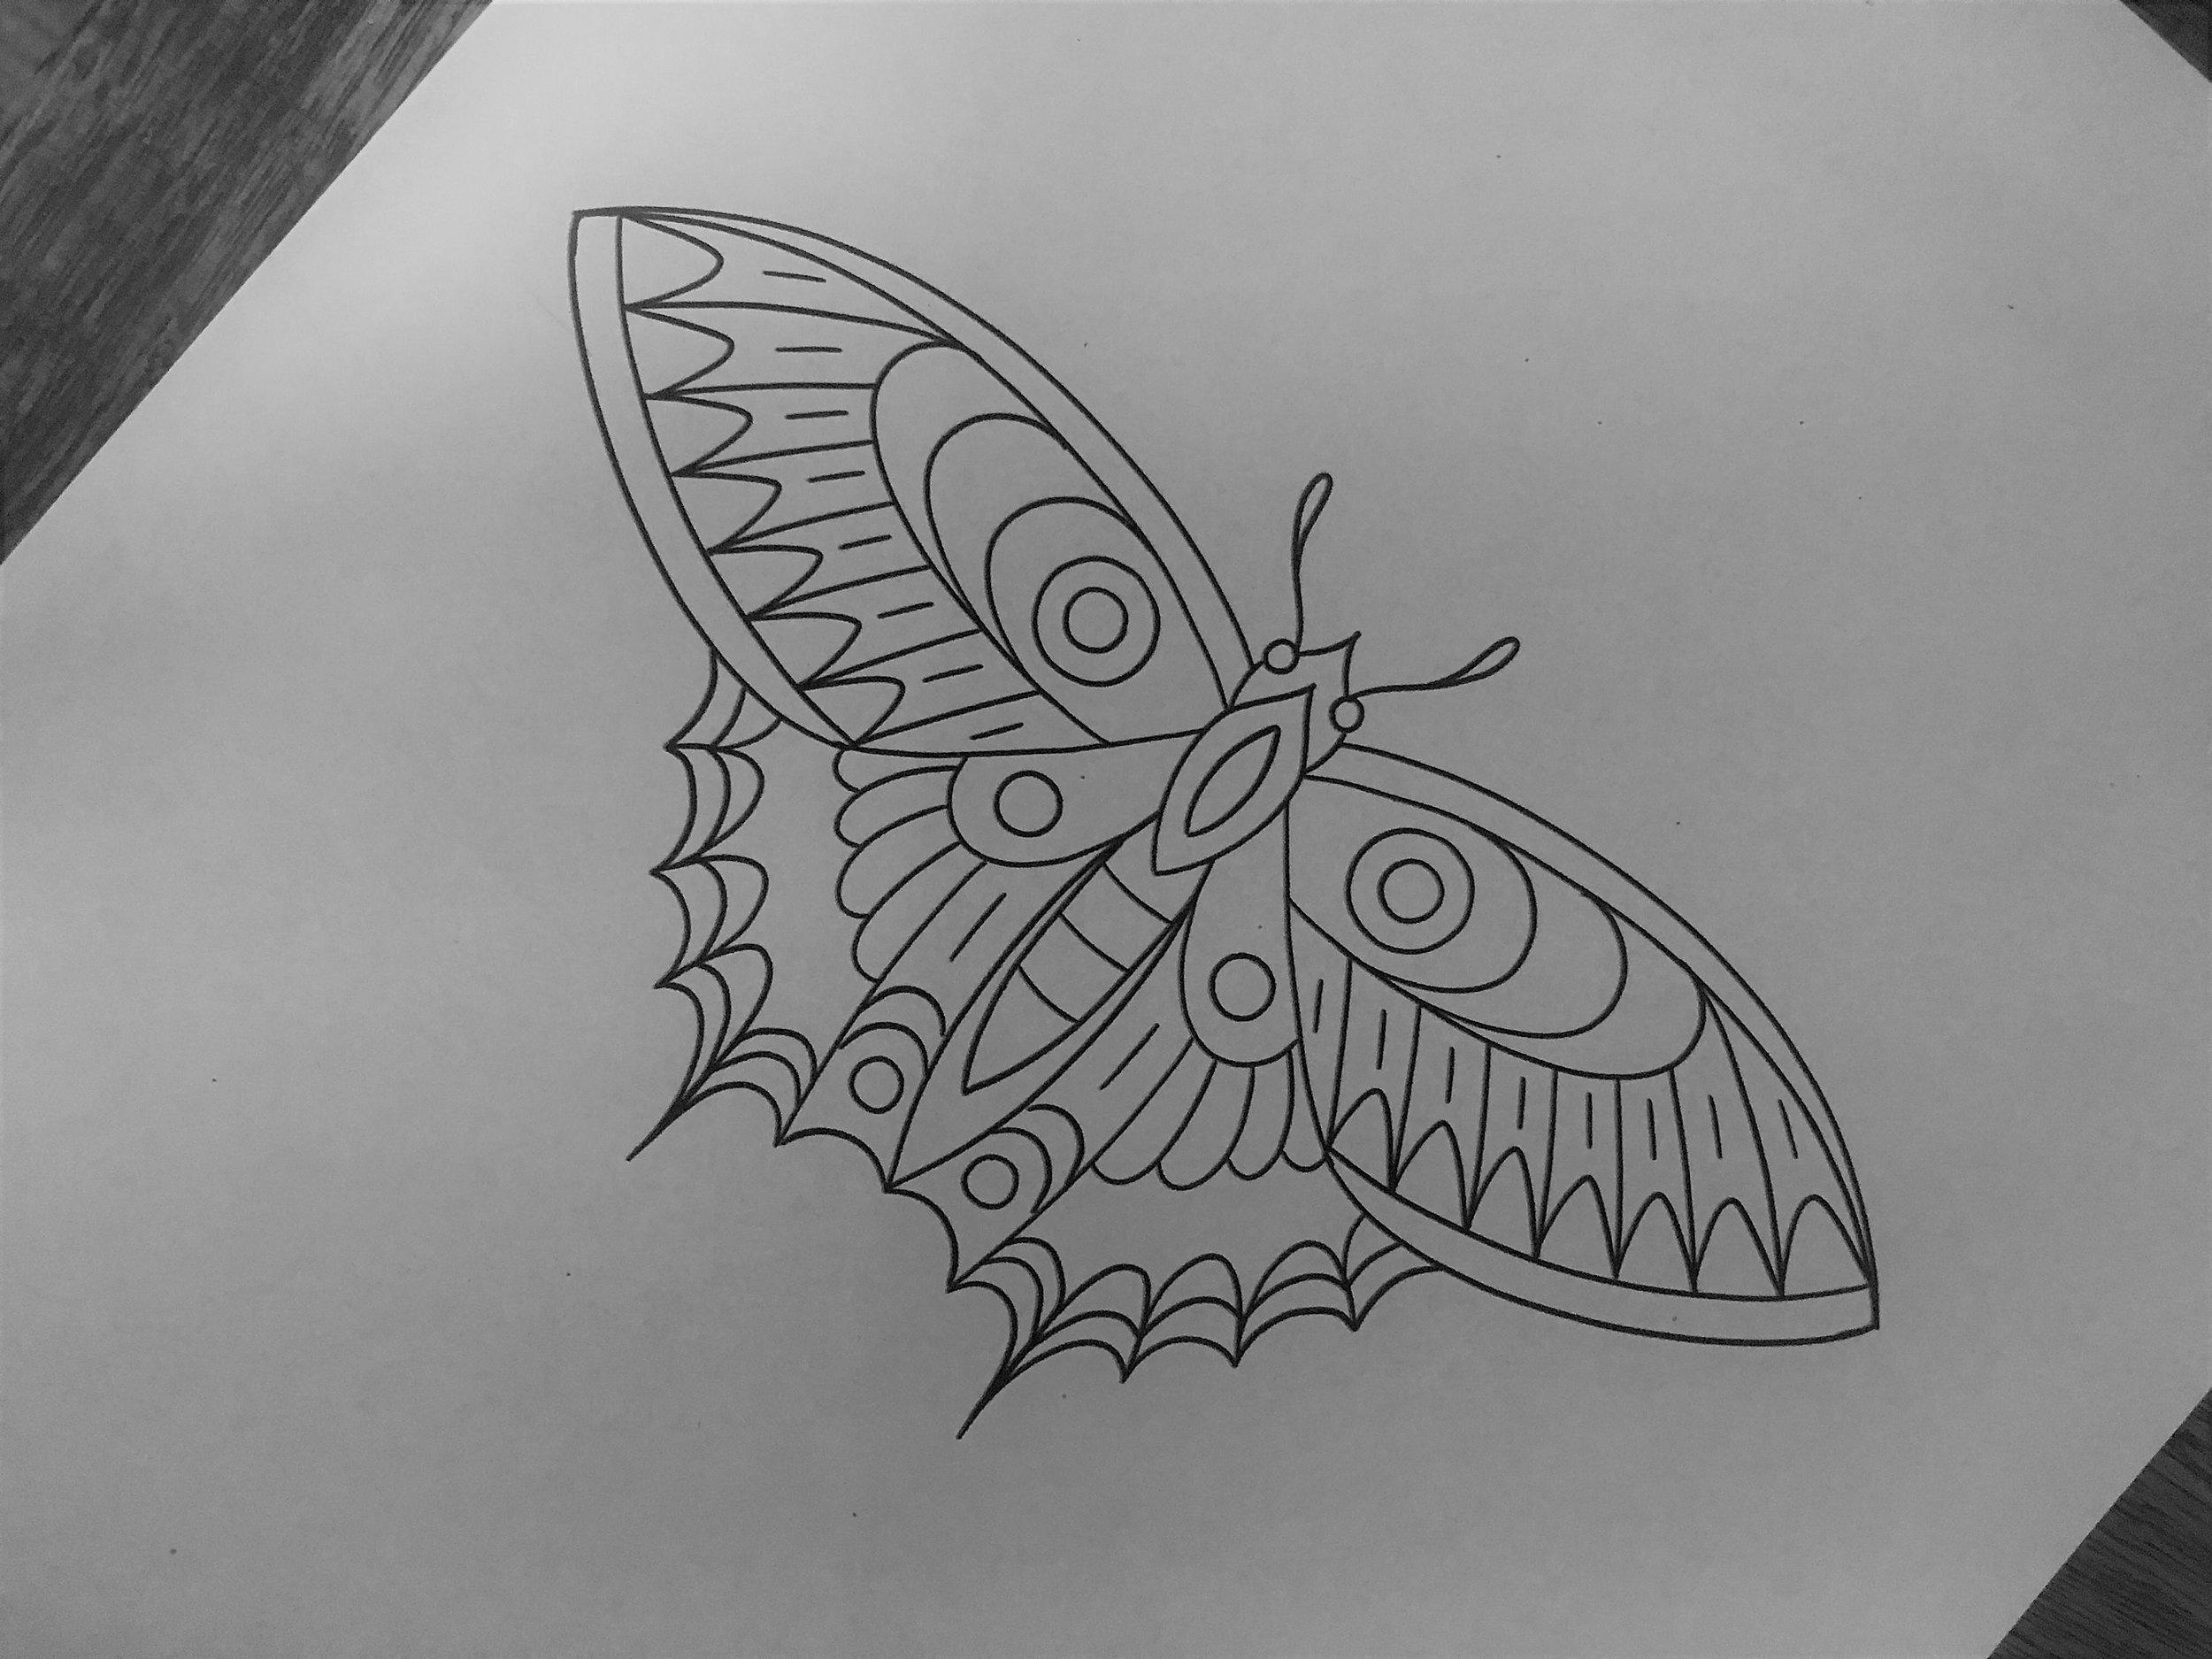 Image: Leonie New from Chapel Tattoo